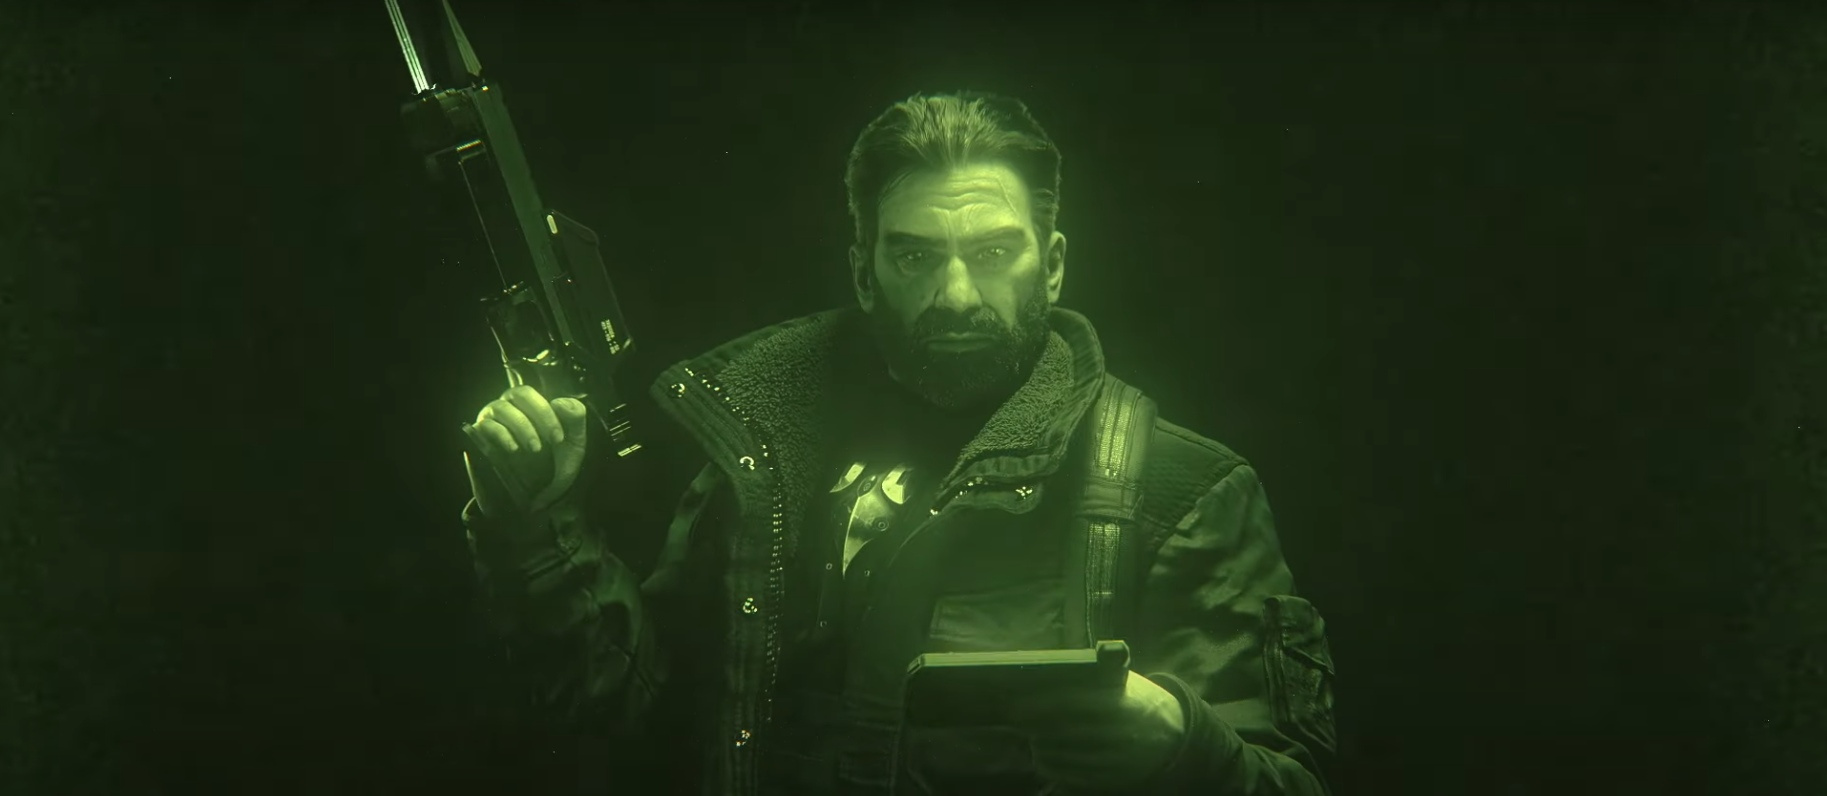 Официально: Сэм Фишер стал следующим оперативником Rainbow Six Siege